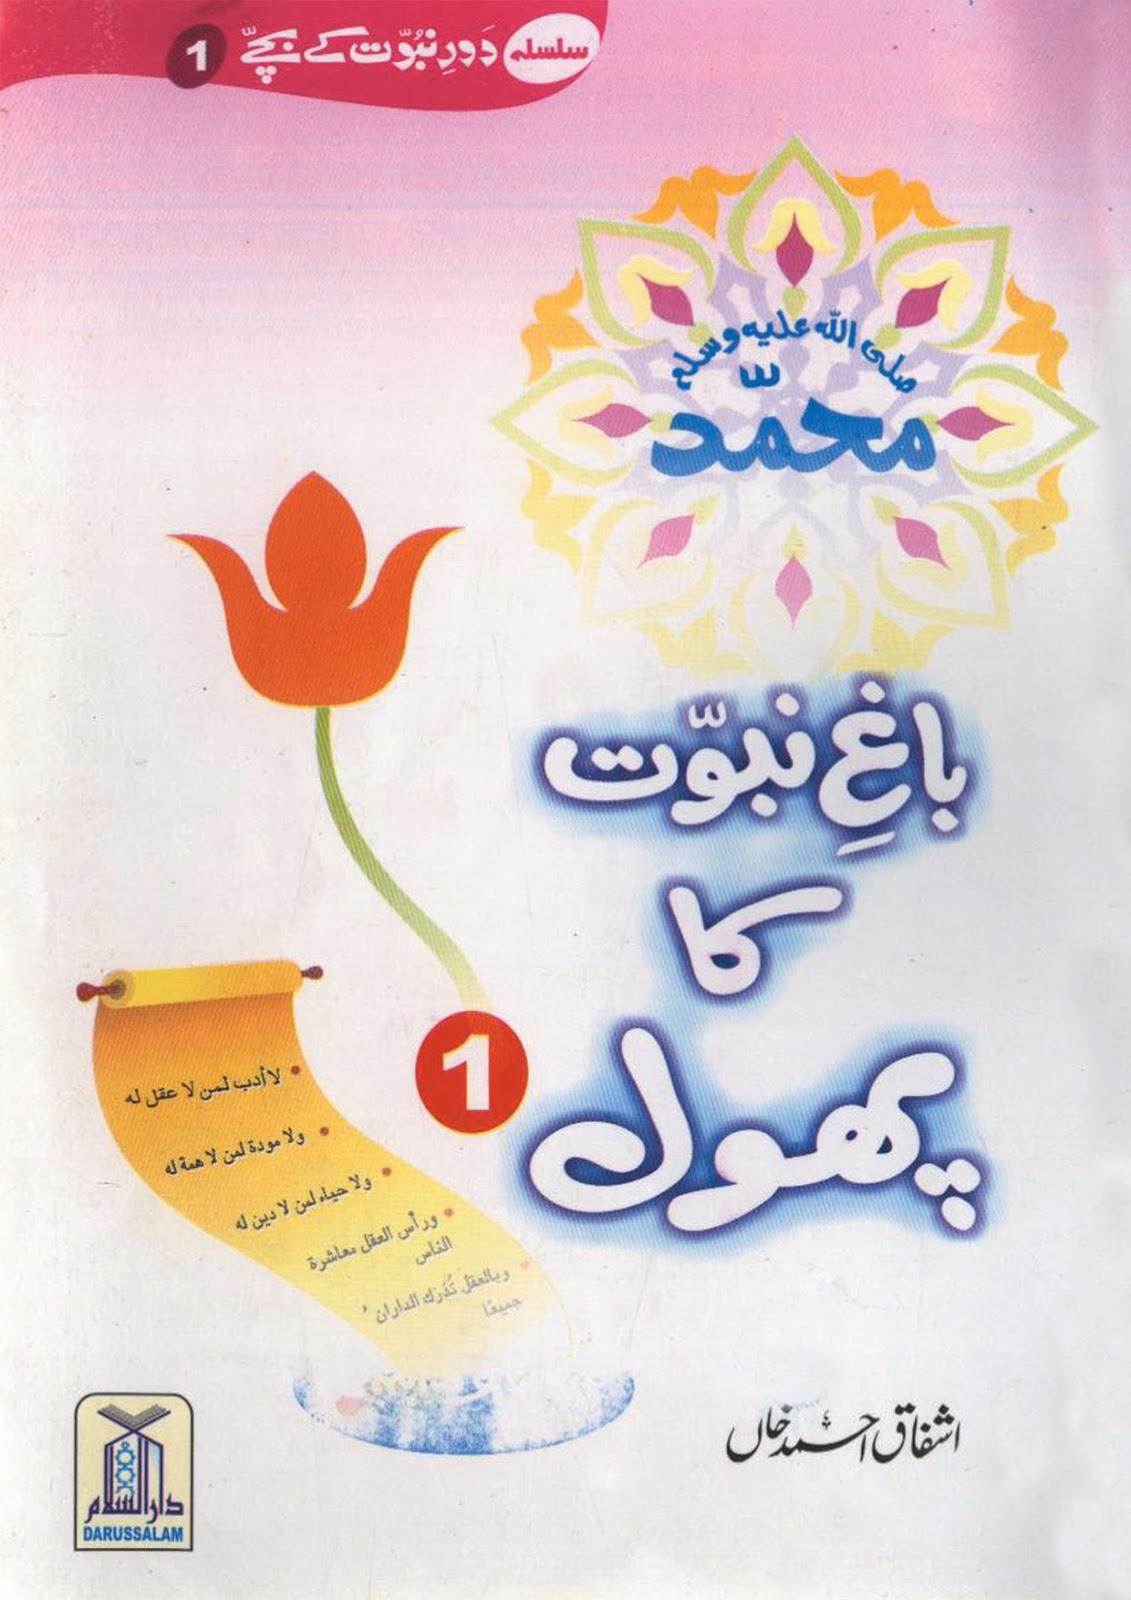 http://urduguru1.blogspot.com/2014/02/dory-nabuwat-ka-phool-1-hasan-ibn-ali-ra.html